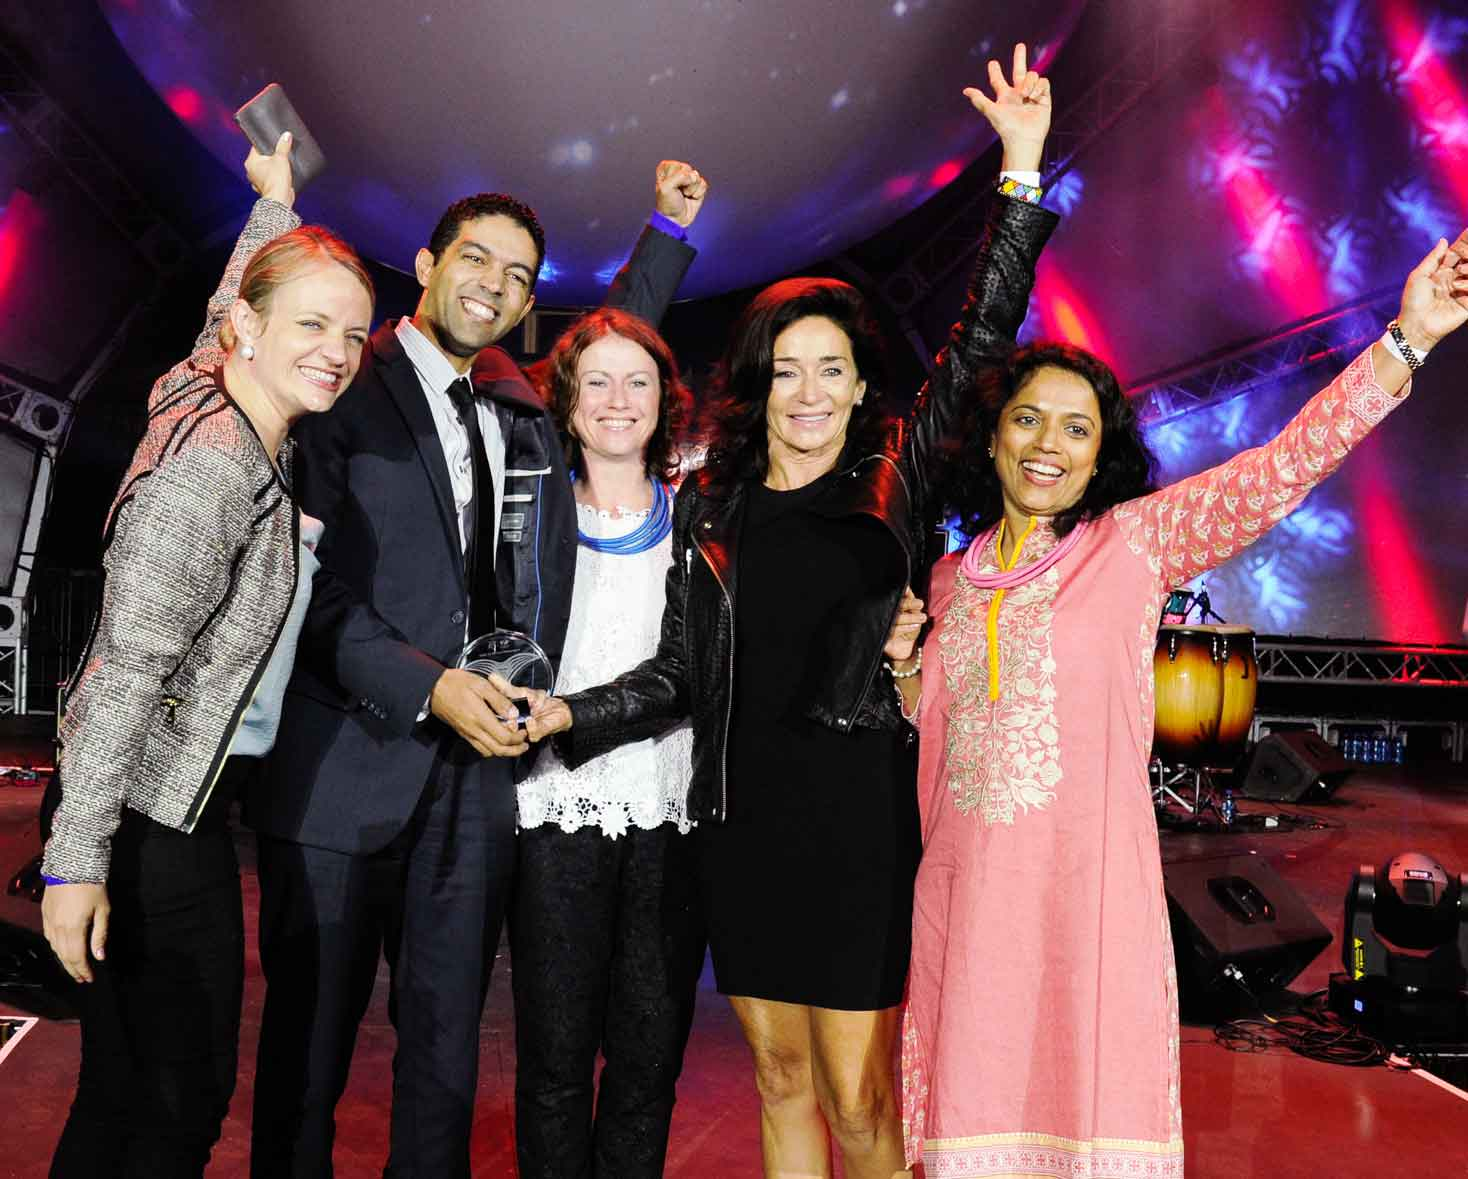 Dubai International DXB Airport wins World Routes Marketing Award 2015